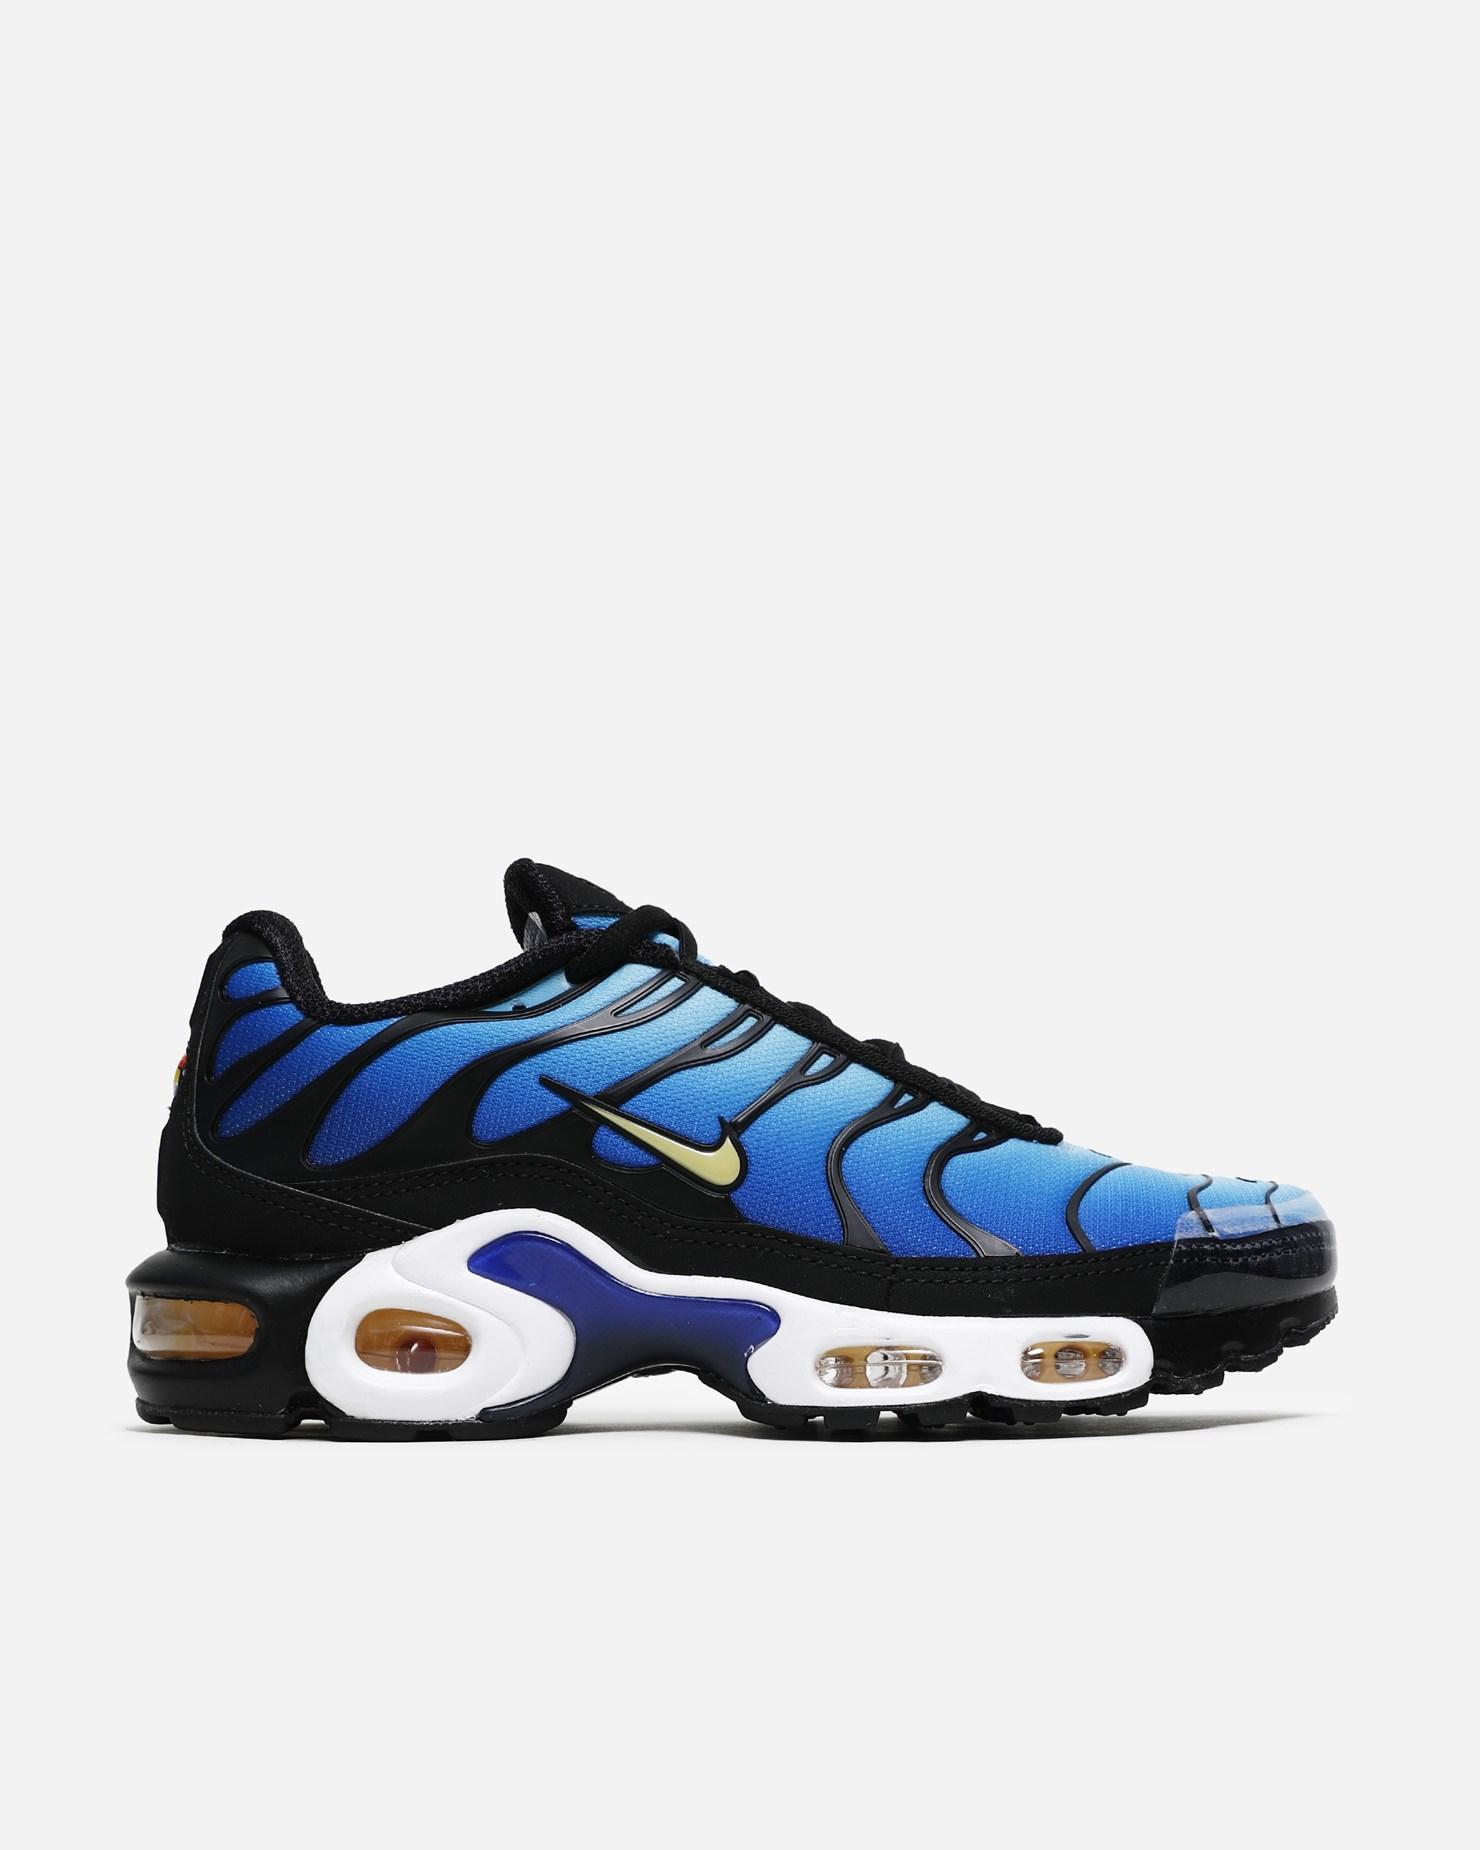 Nike Sportswear Air Max Plus TN OG Black/Chamois/Sky Blue